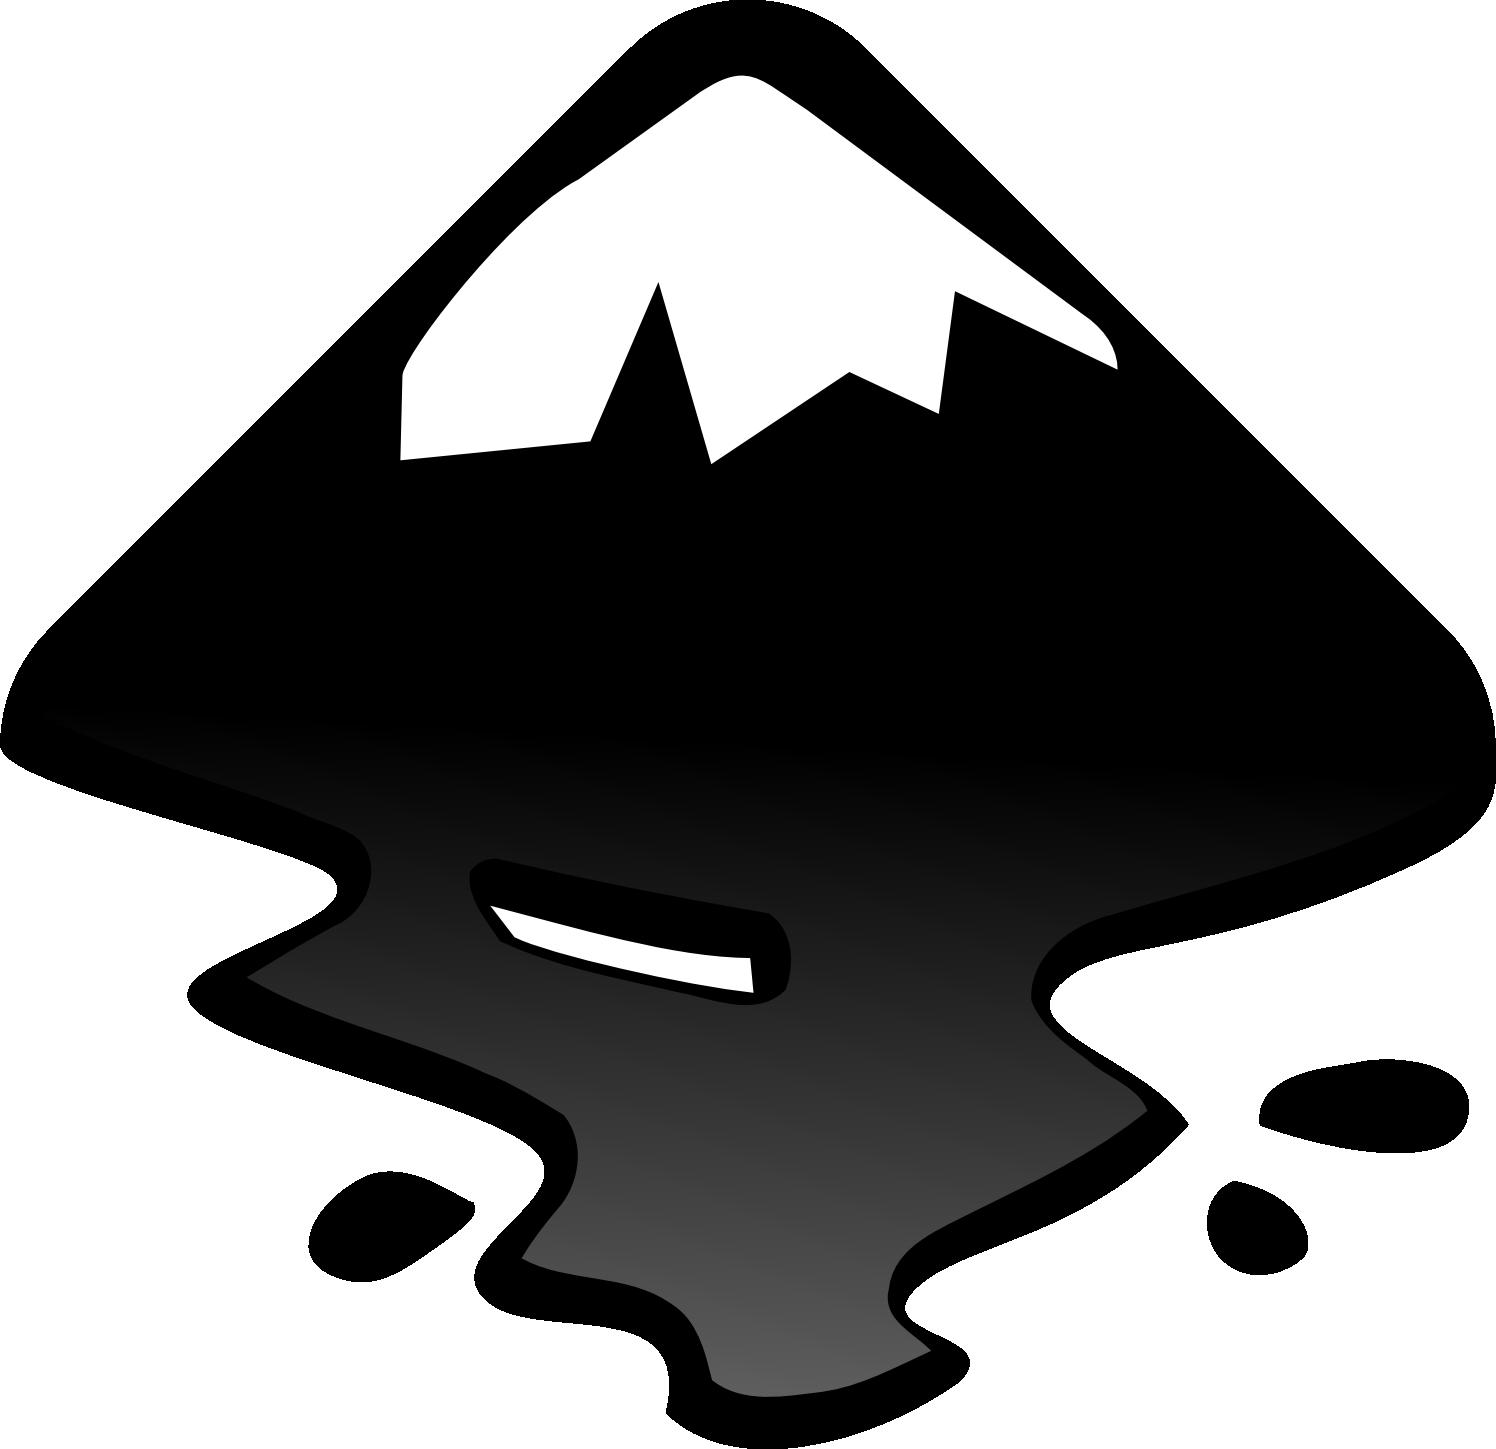 inkscape-logo-40.png?nocache=1309009417024